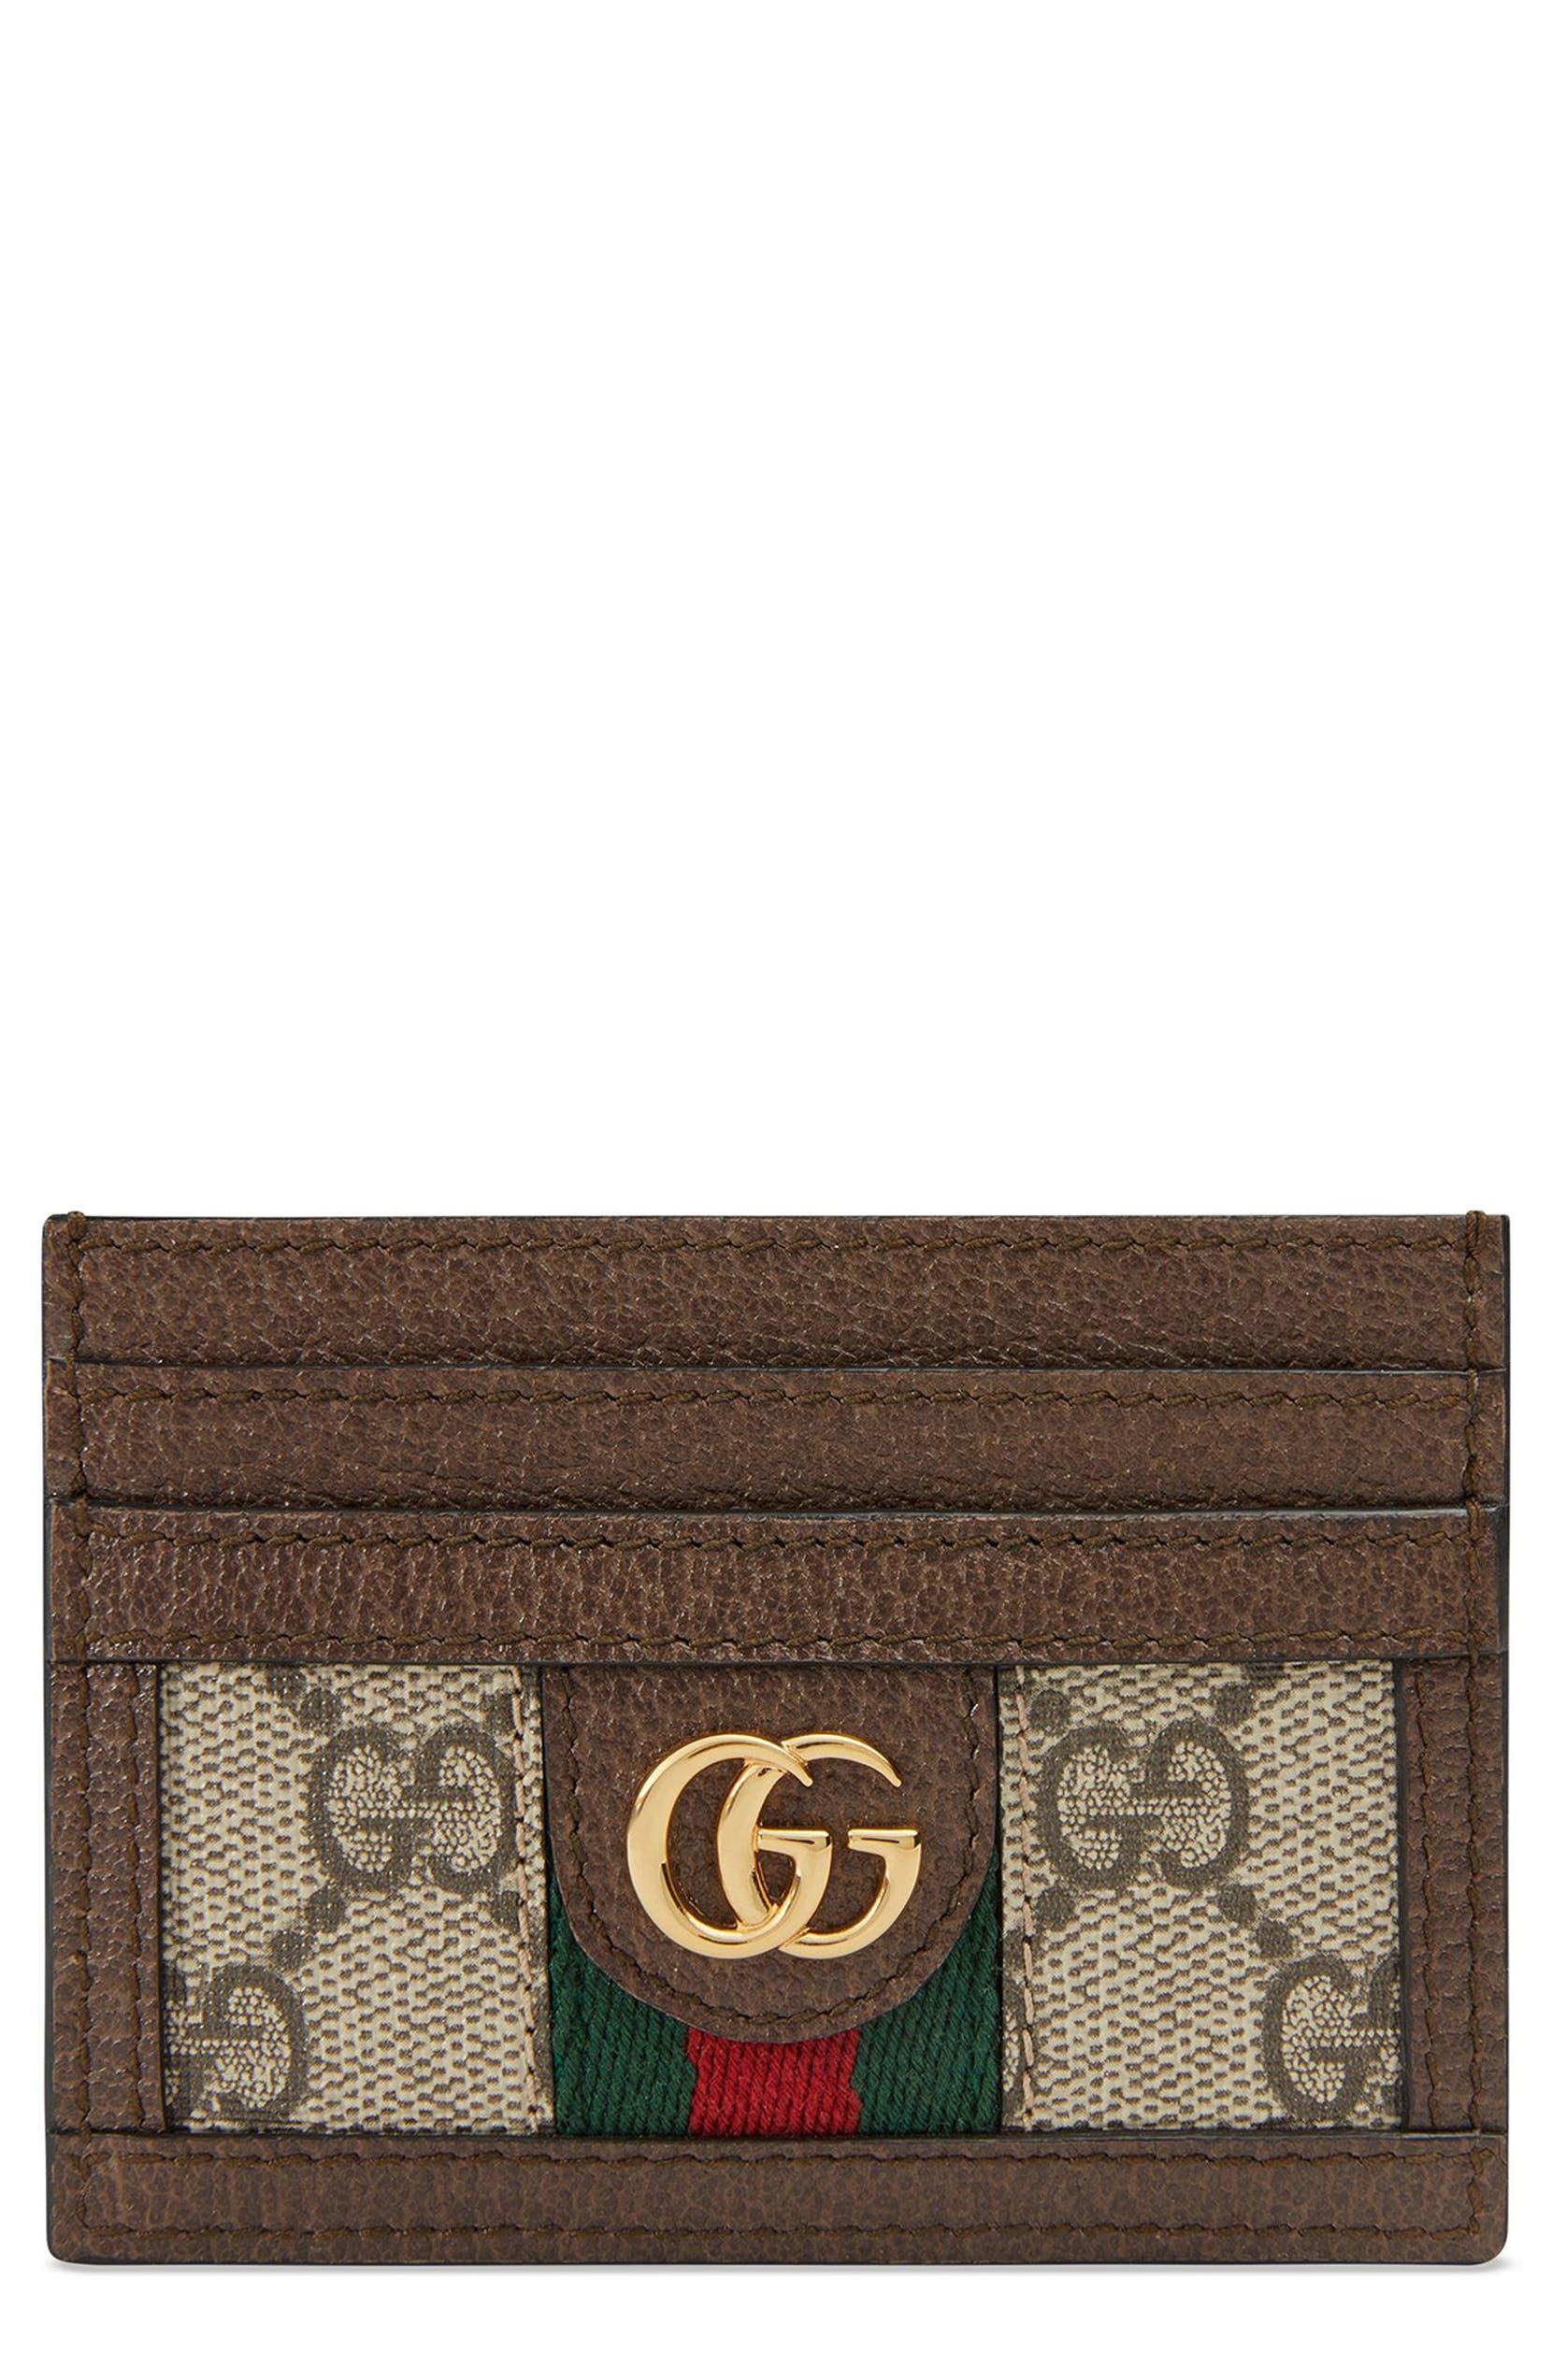 332c854304bd2d Gucci Ophidia GG Supreme Card Case | Nordstrom